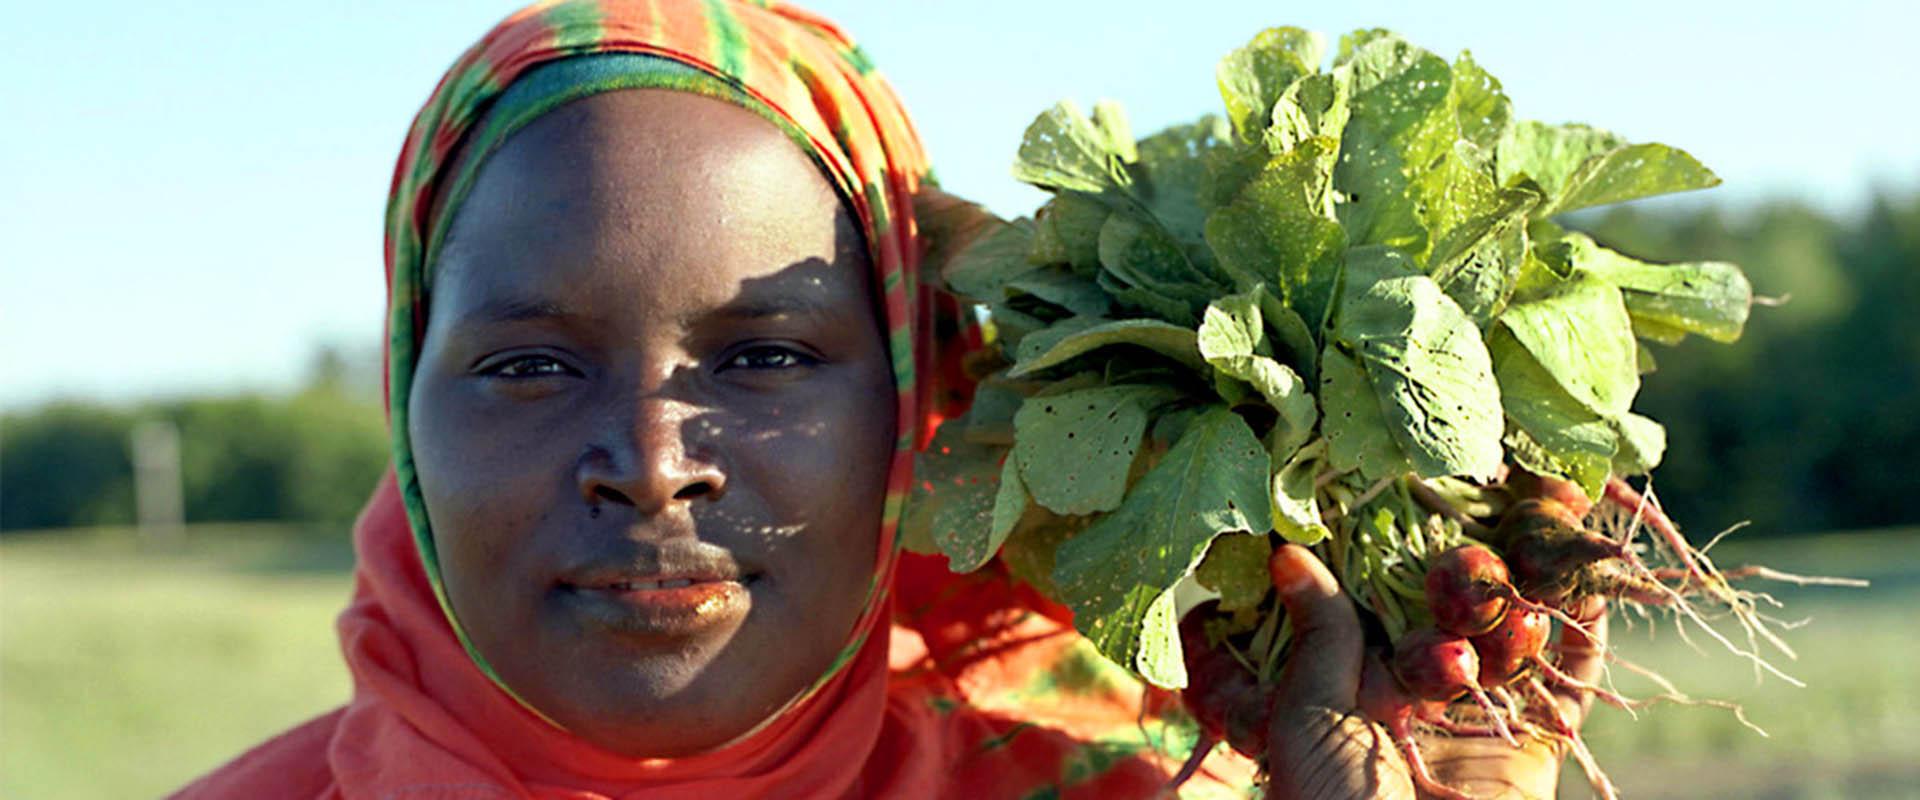 Somali Bantu Farming Project